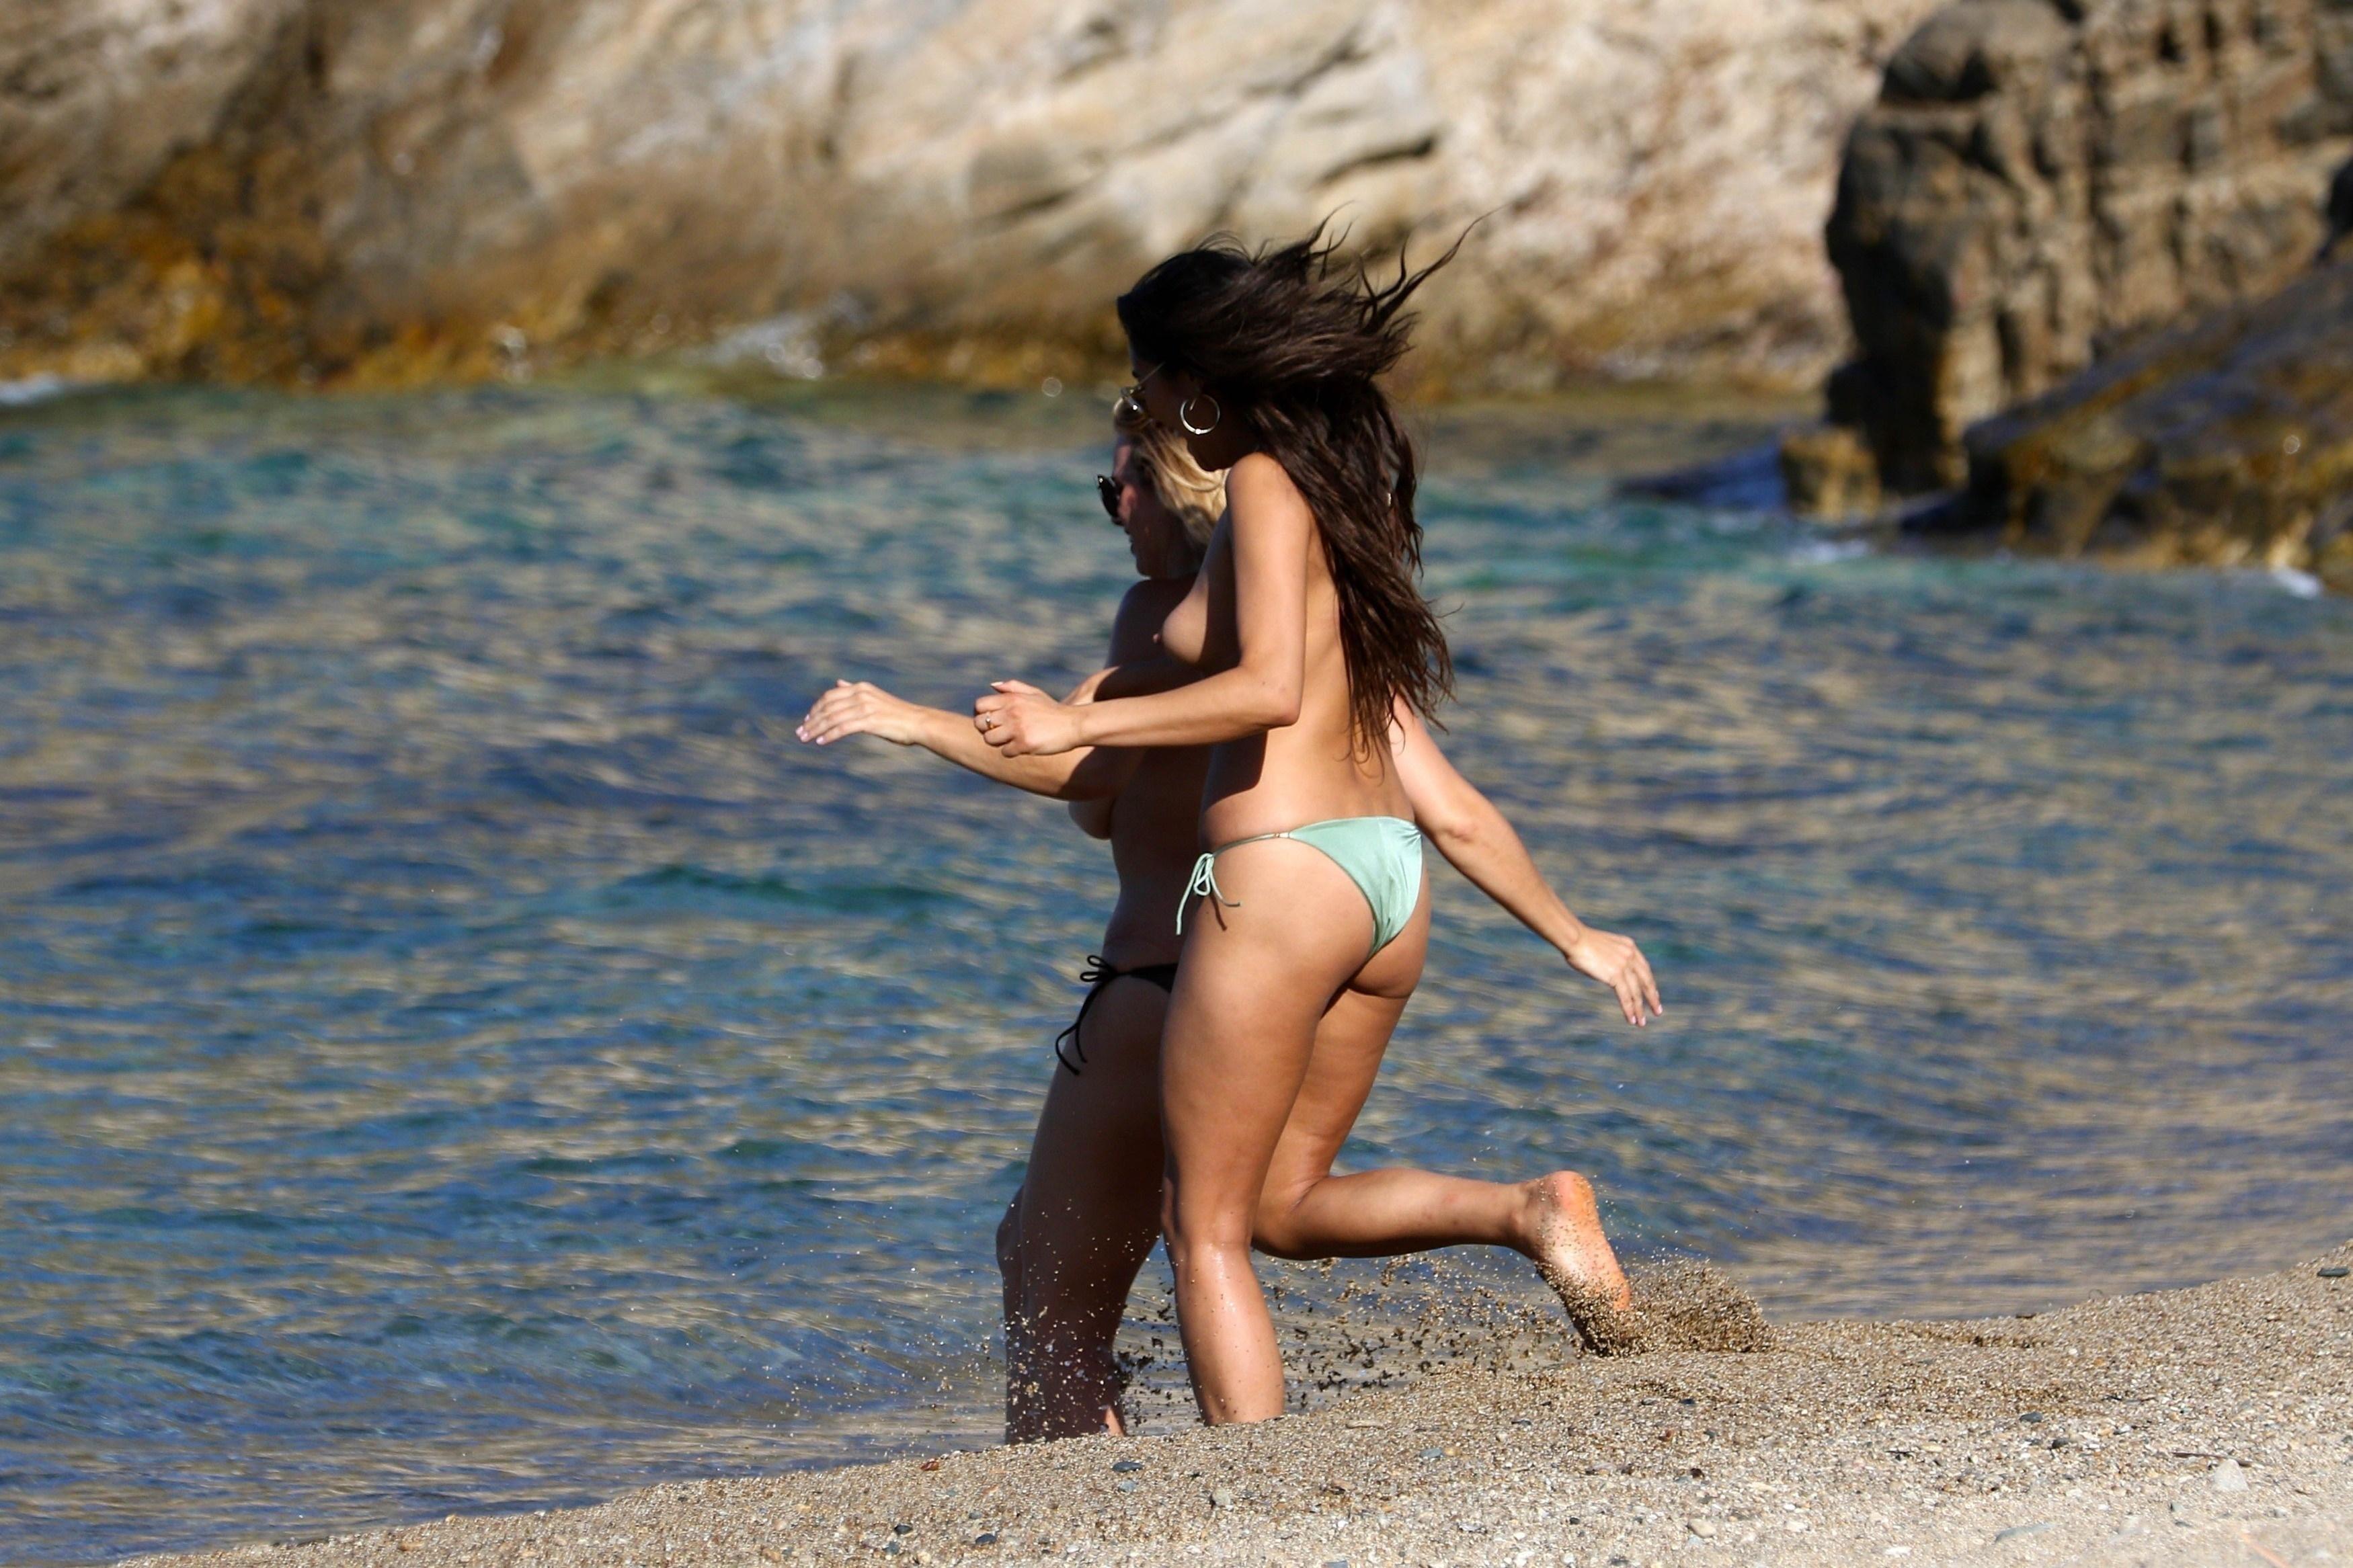 Boobs Wanessa Milhomem nude (54 photos), Pussy, Sideboobs, Selfie, in bikini 2020